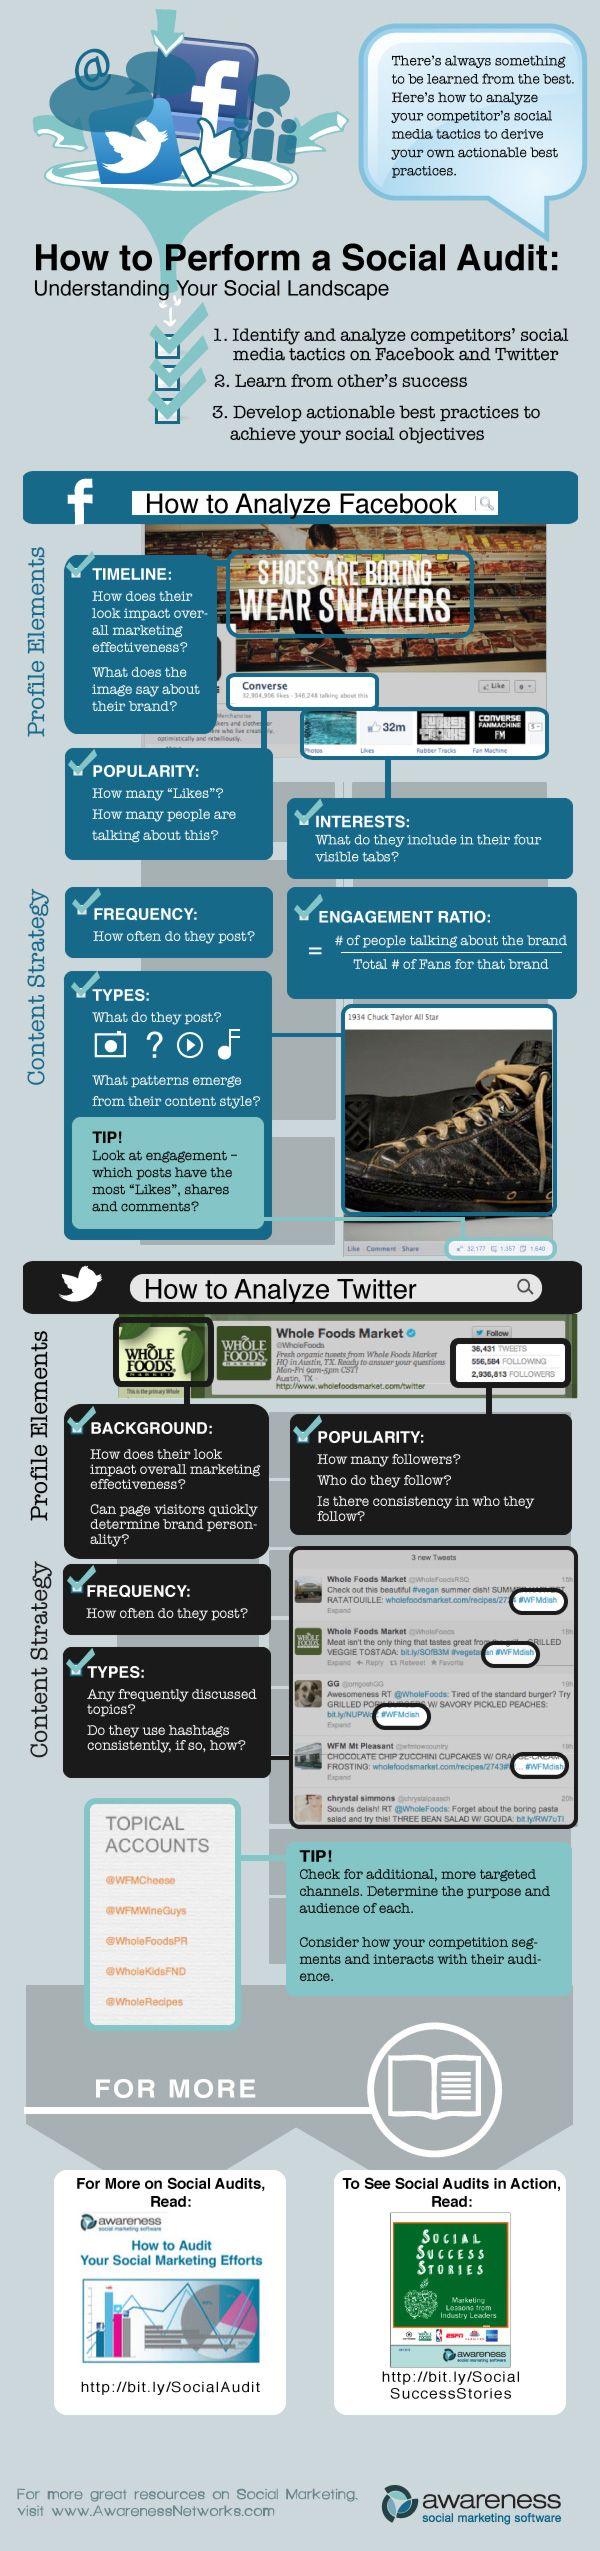 Social Audit Infographic